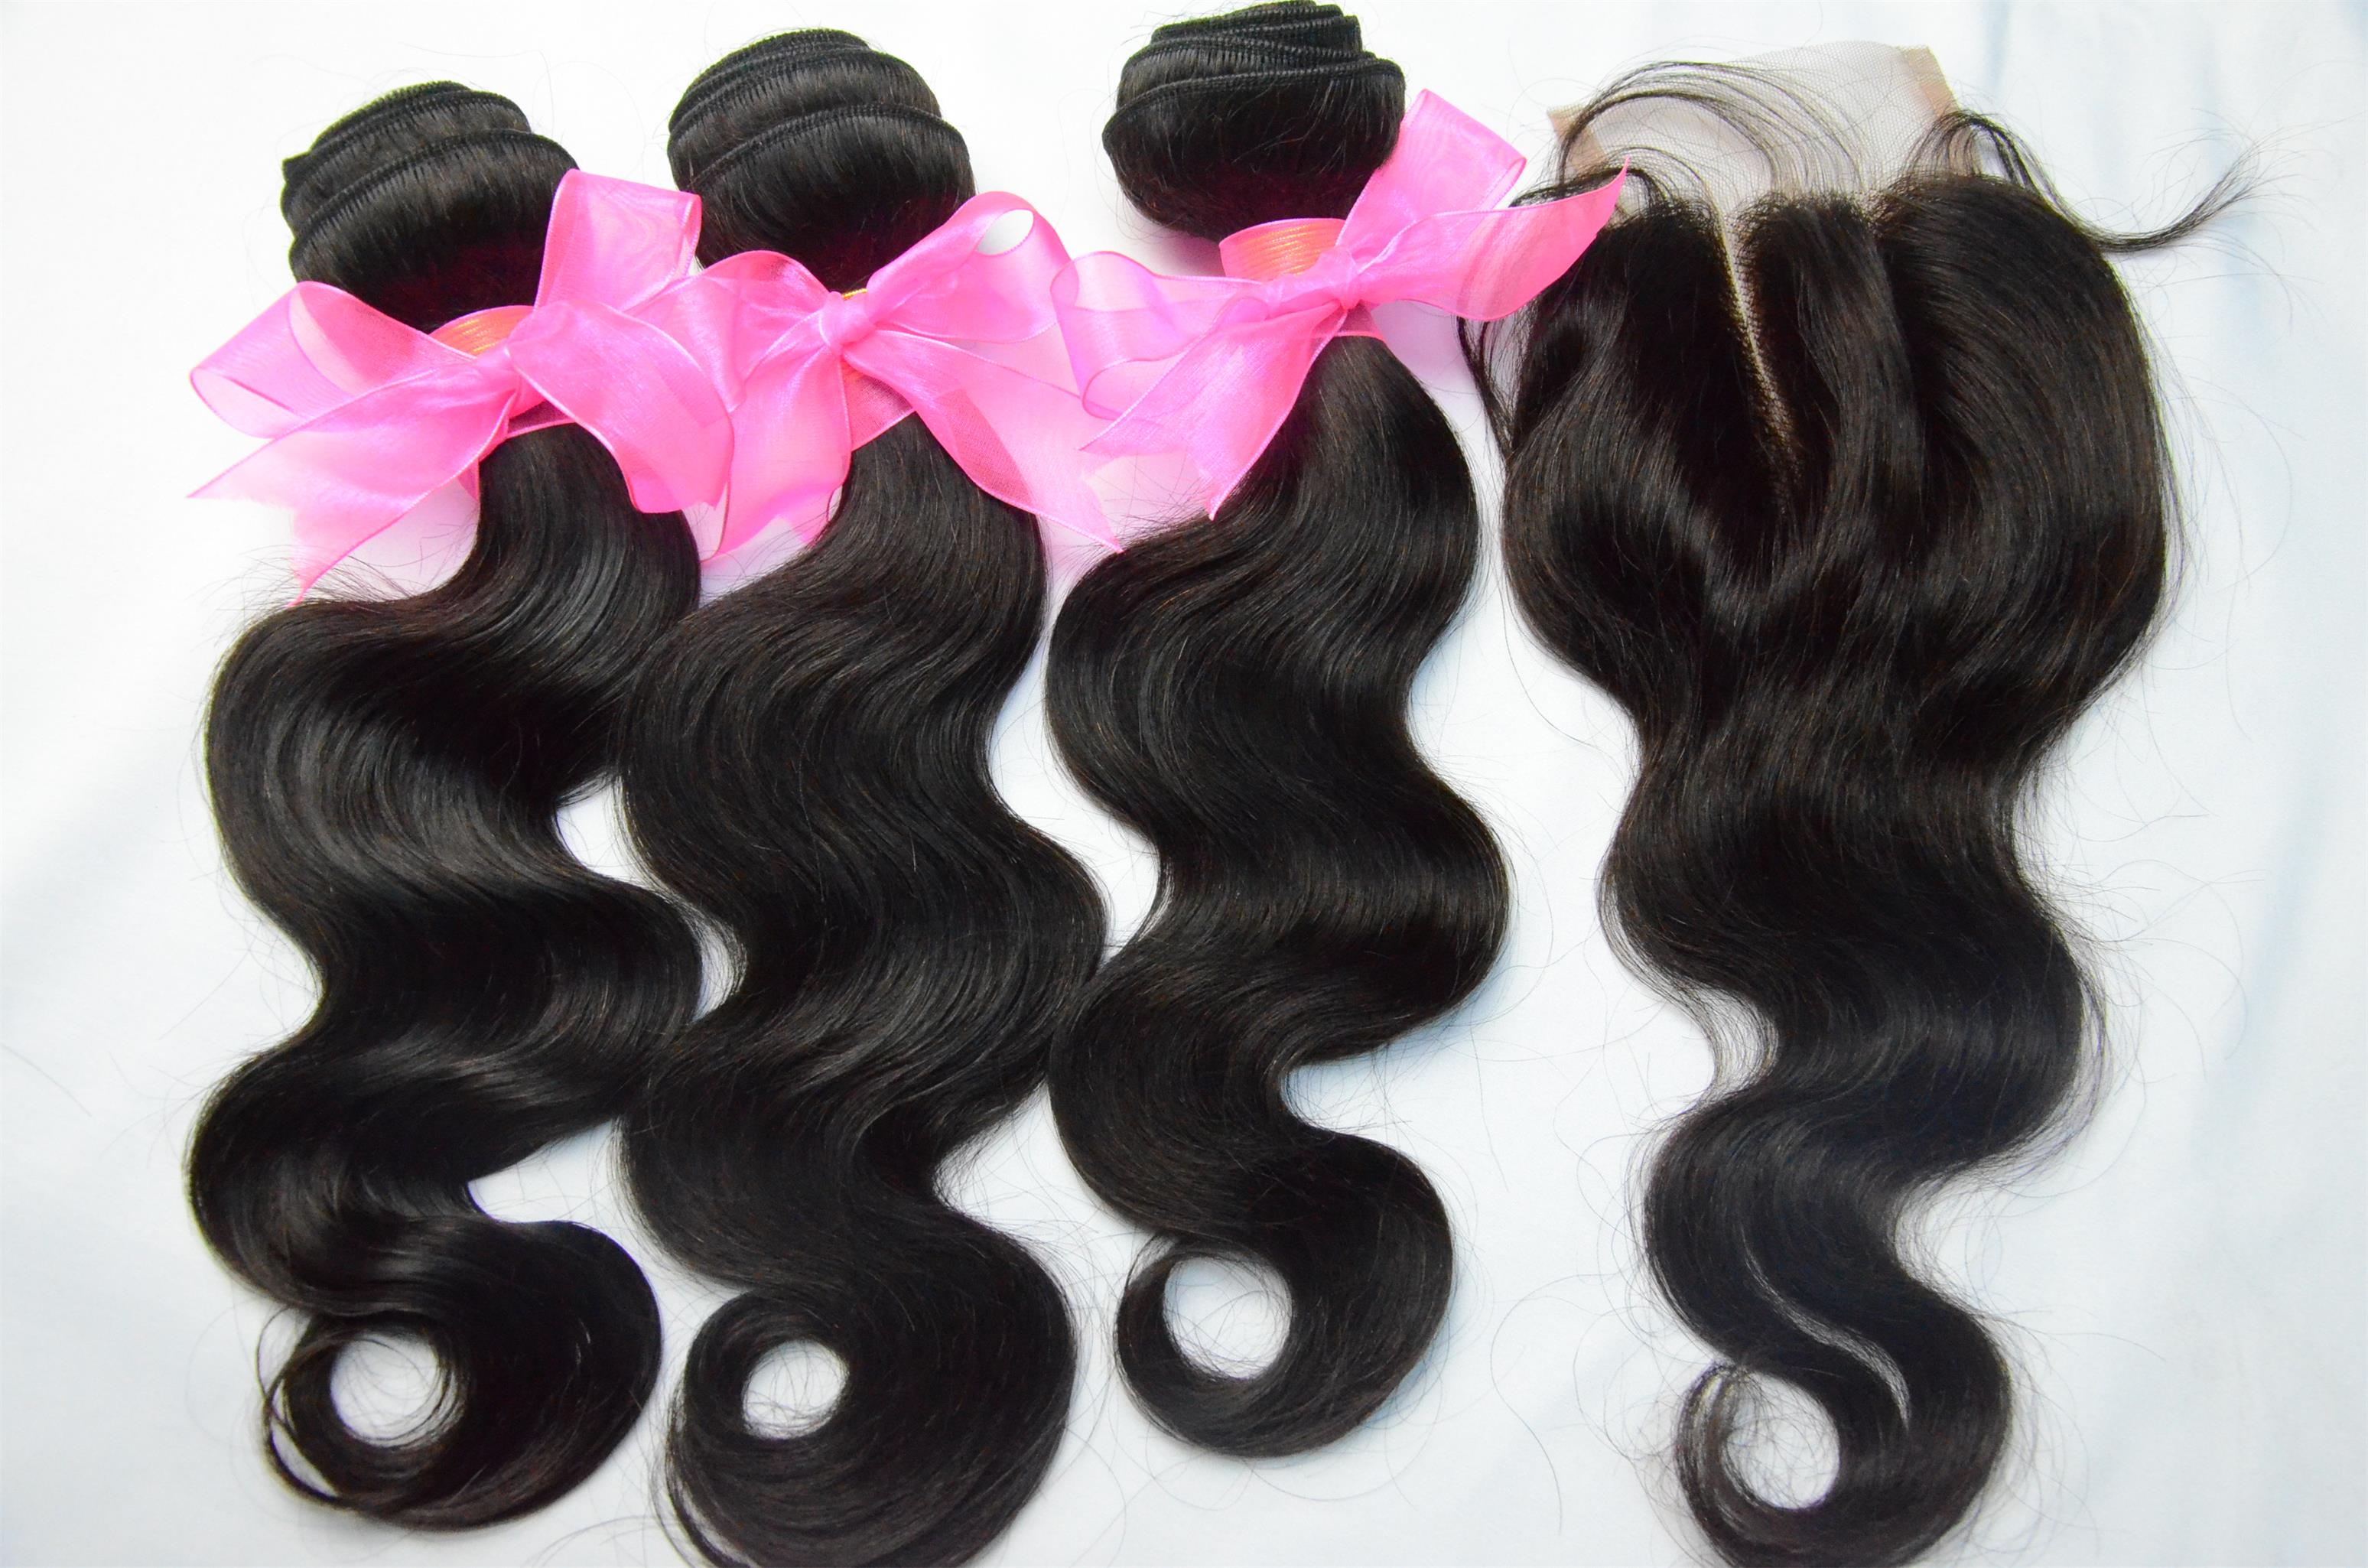 Hot selling European and American human hair mechanism hair weft real person wig clockwork snake mus